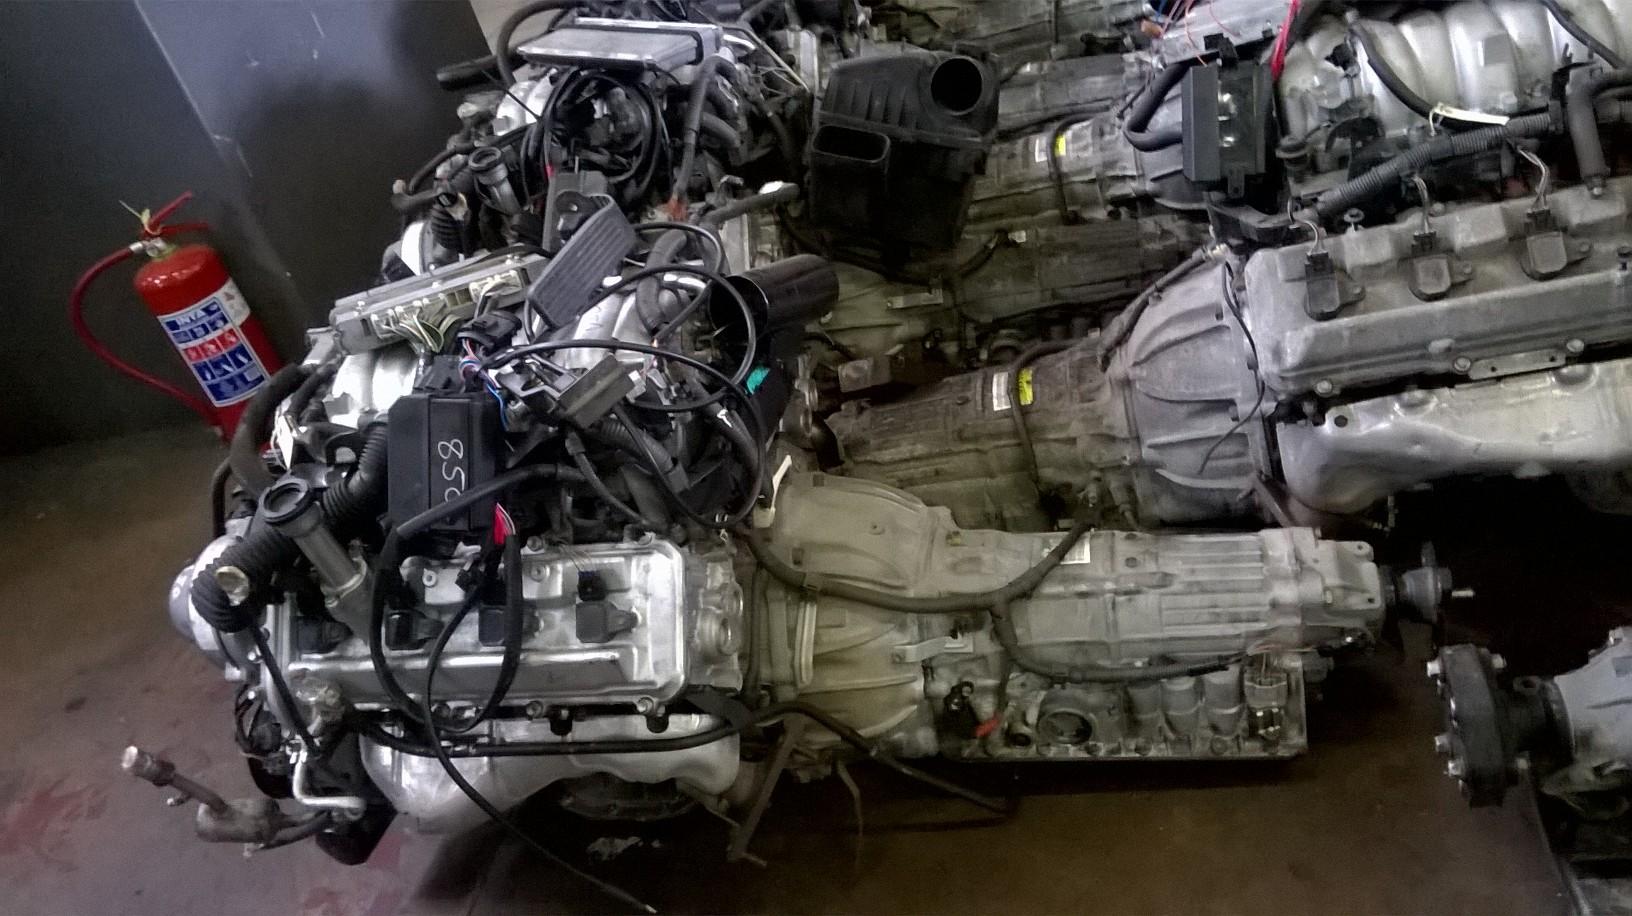 Lexus 4.0 V8 Prewired VVTi Engine & Auto Gearbox # 1UZ